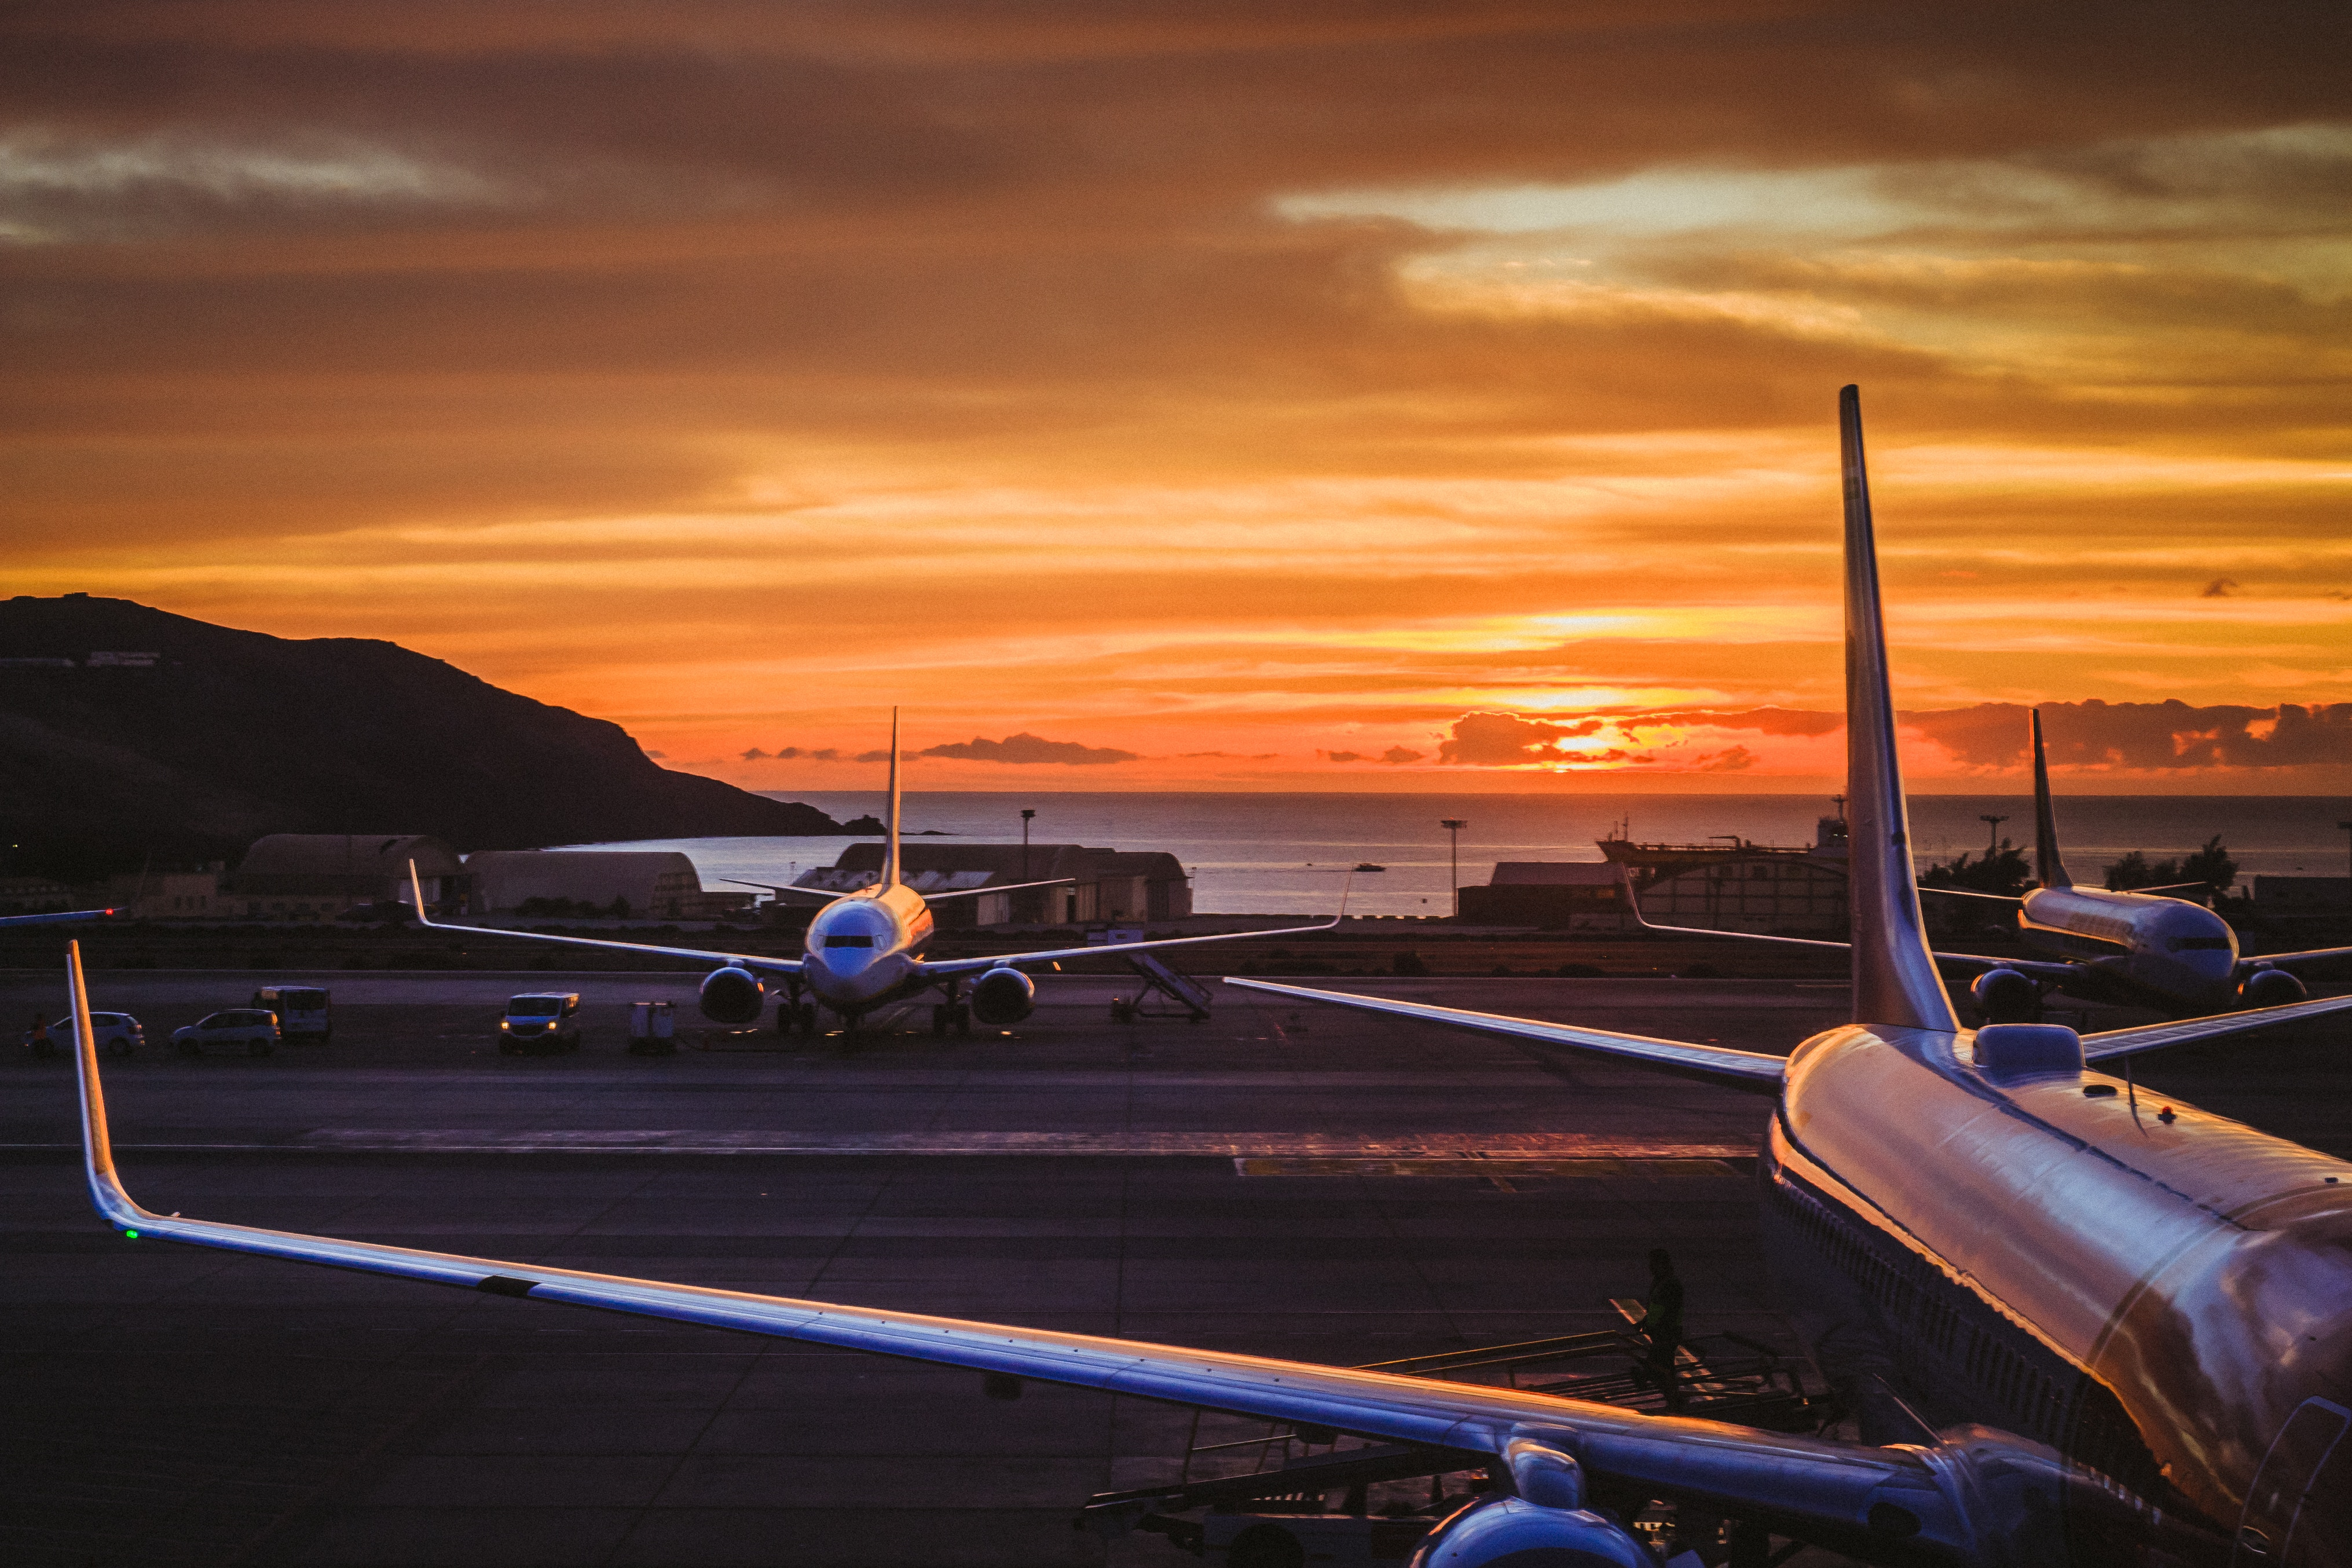 Aviation / Aerospace Degree from Everglades University